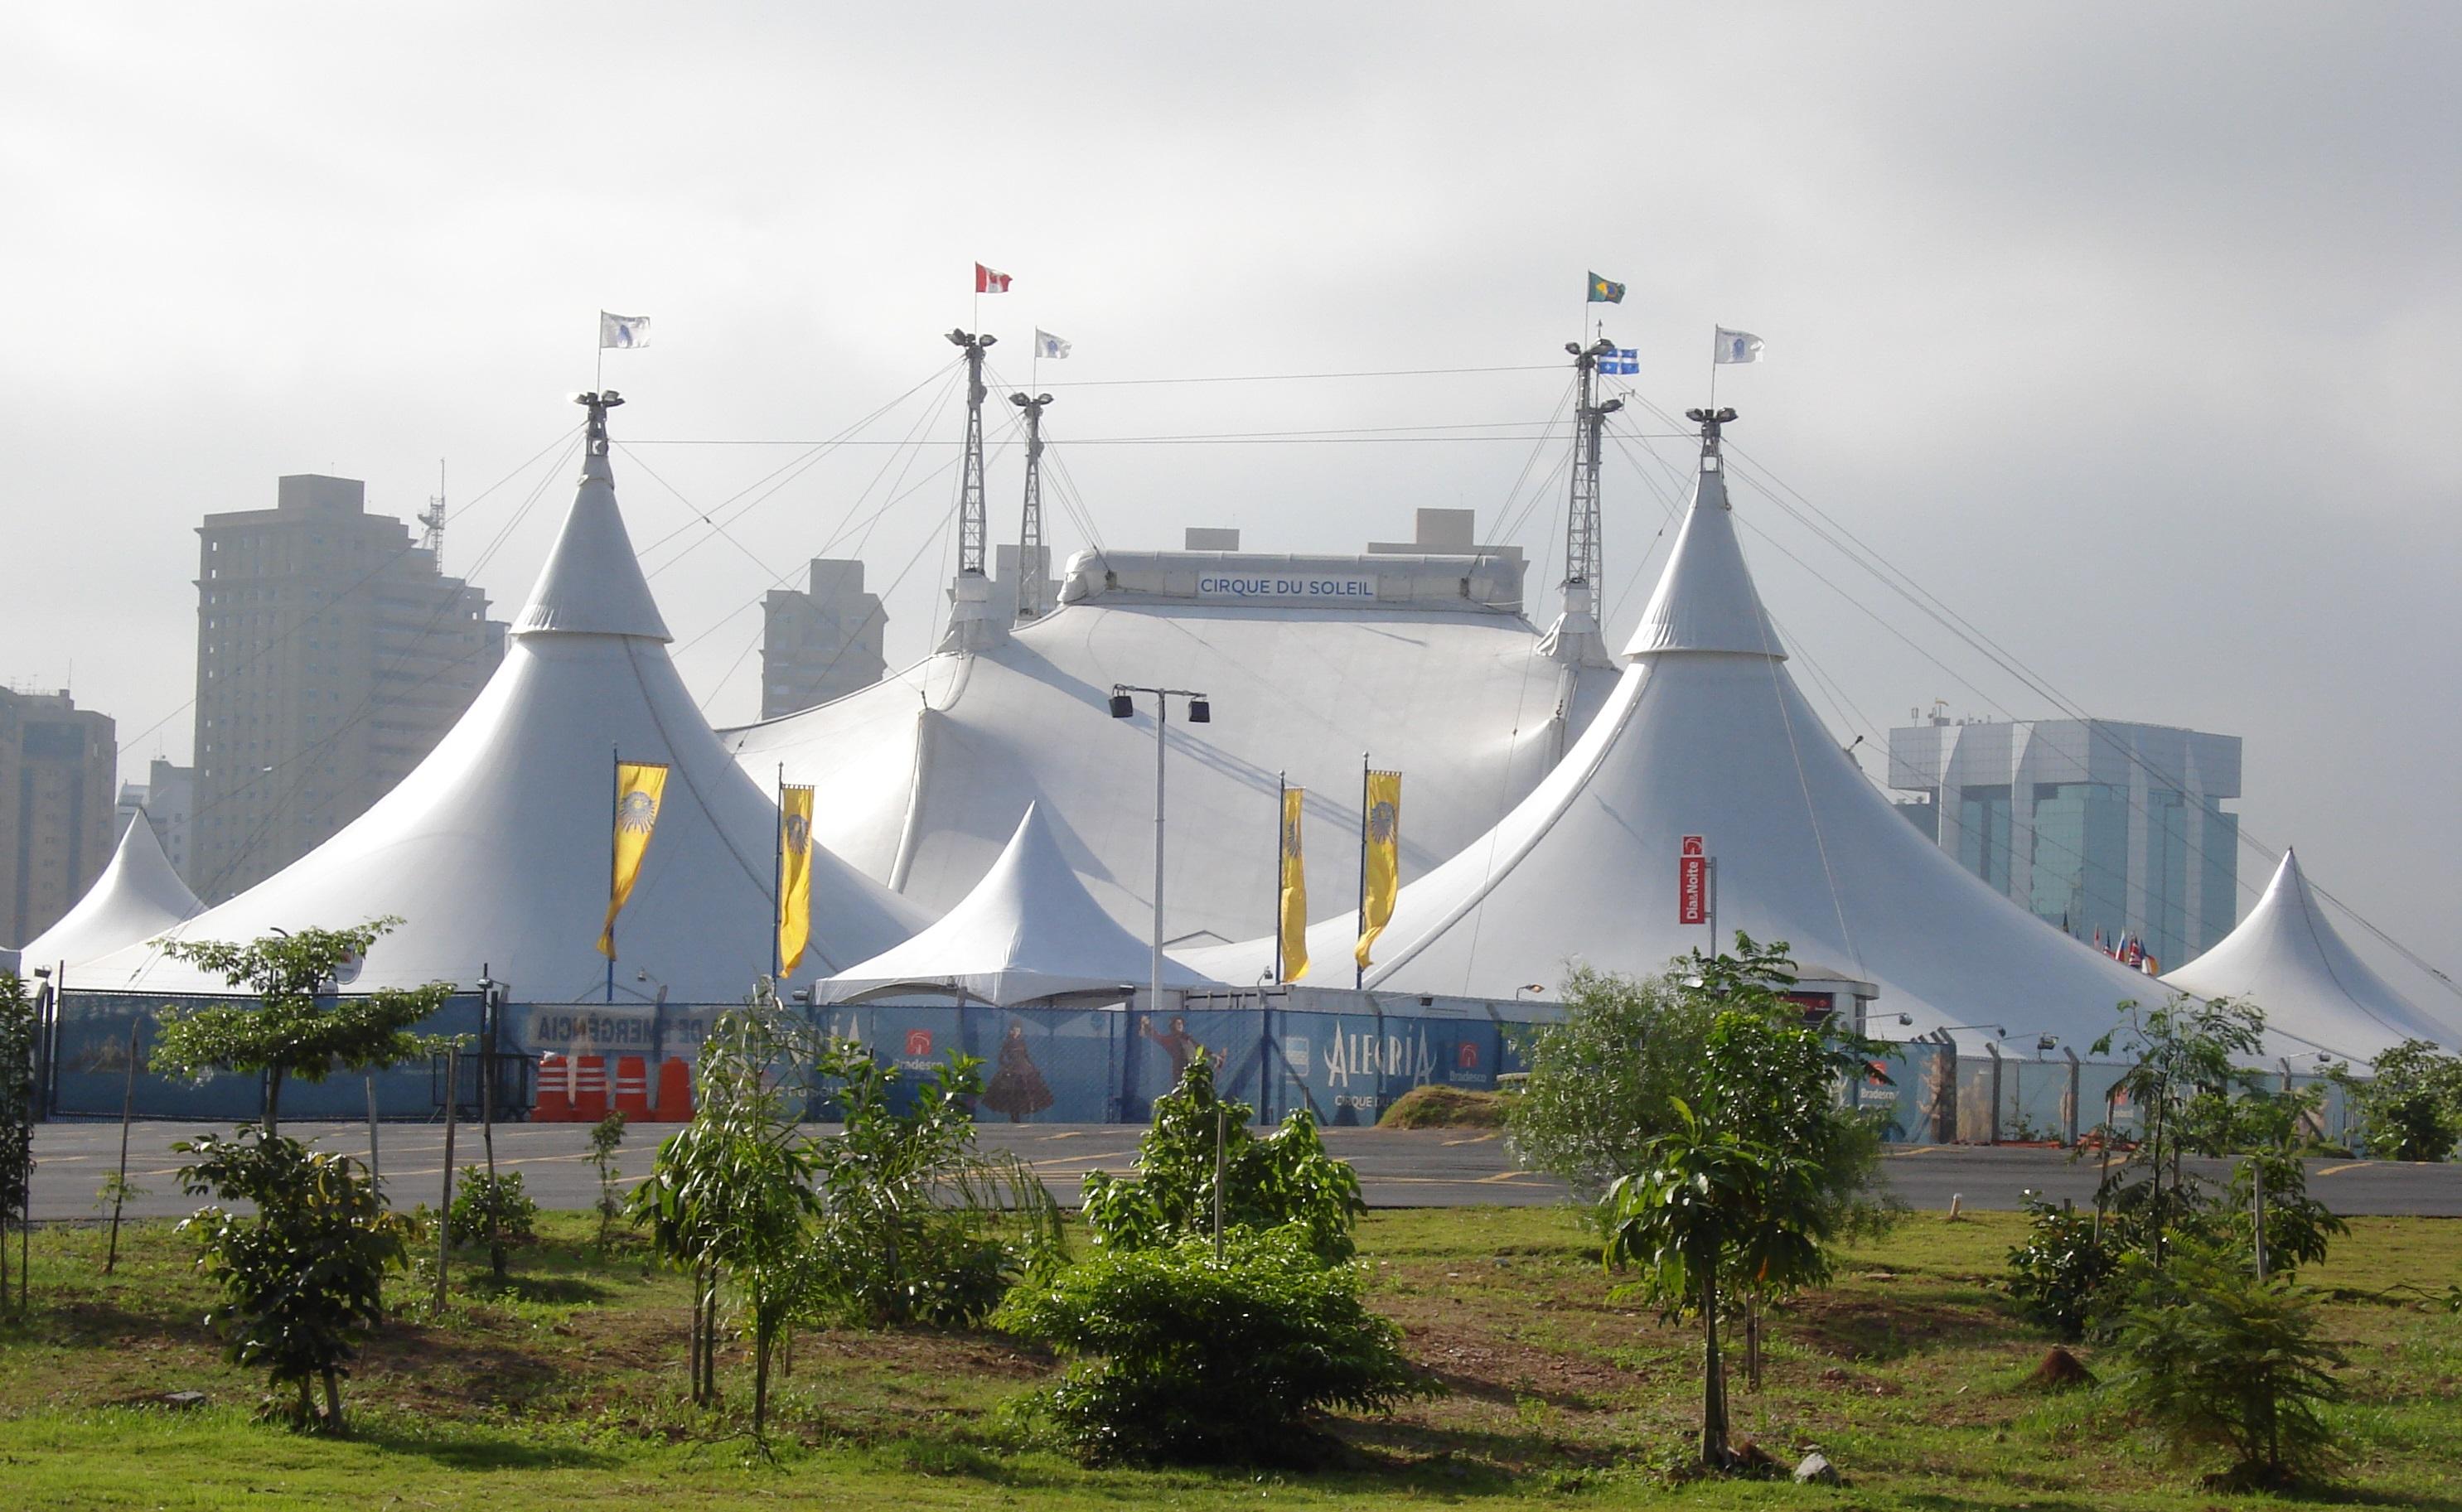 Alegra Cirque Du Soleil Wikipedia Maya Red Top Leux Studio Set And Technical Informationedit